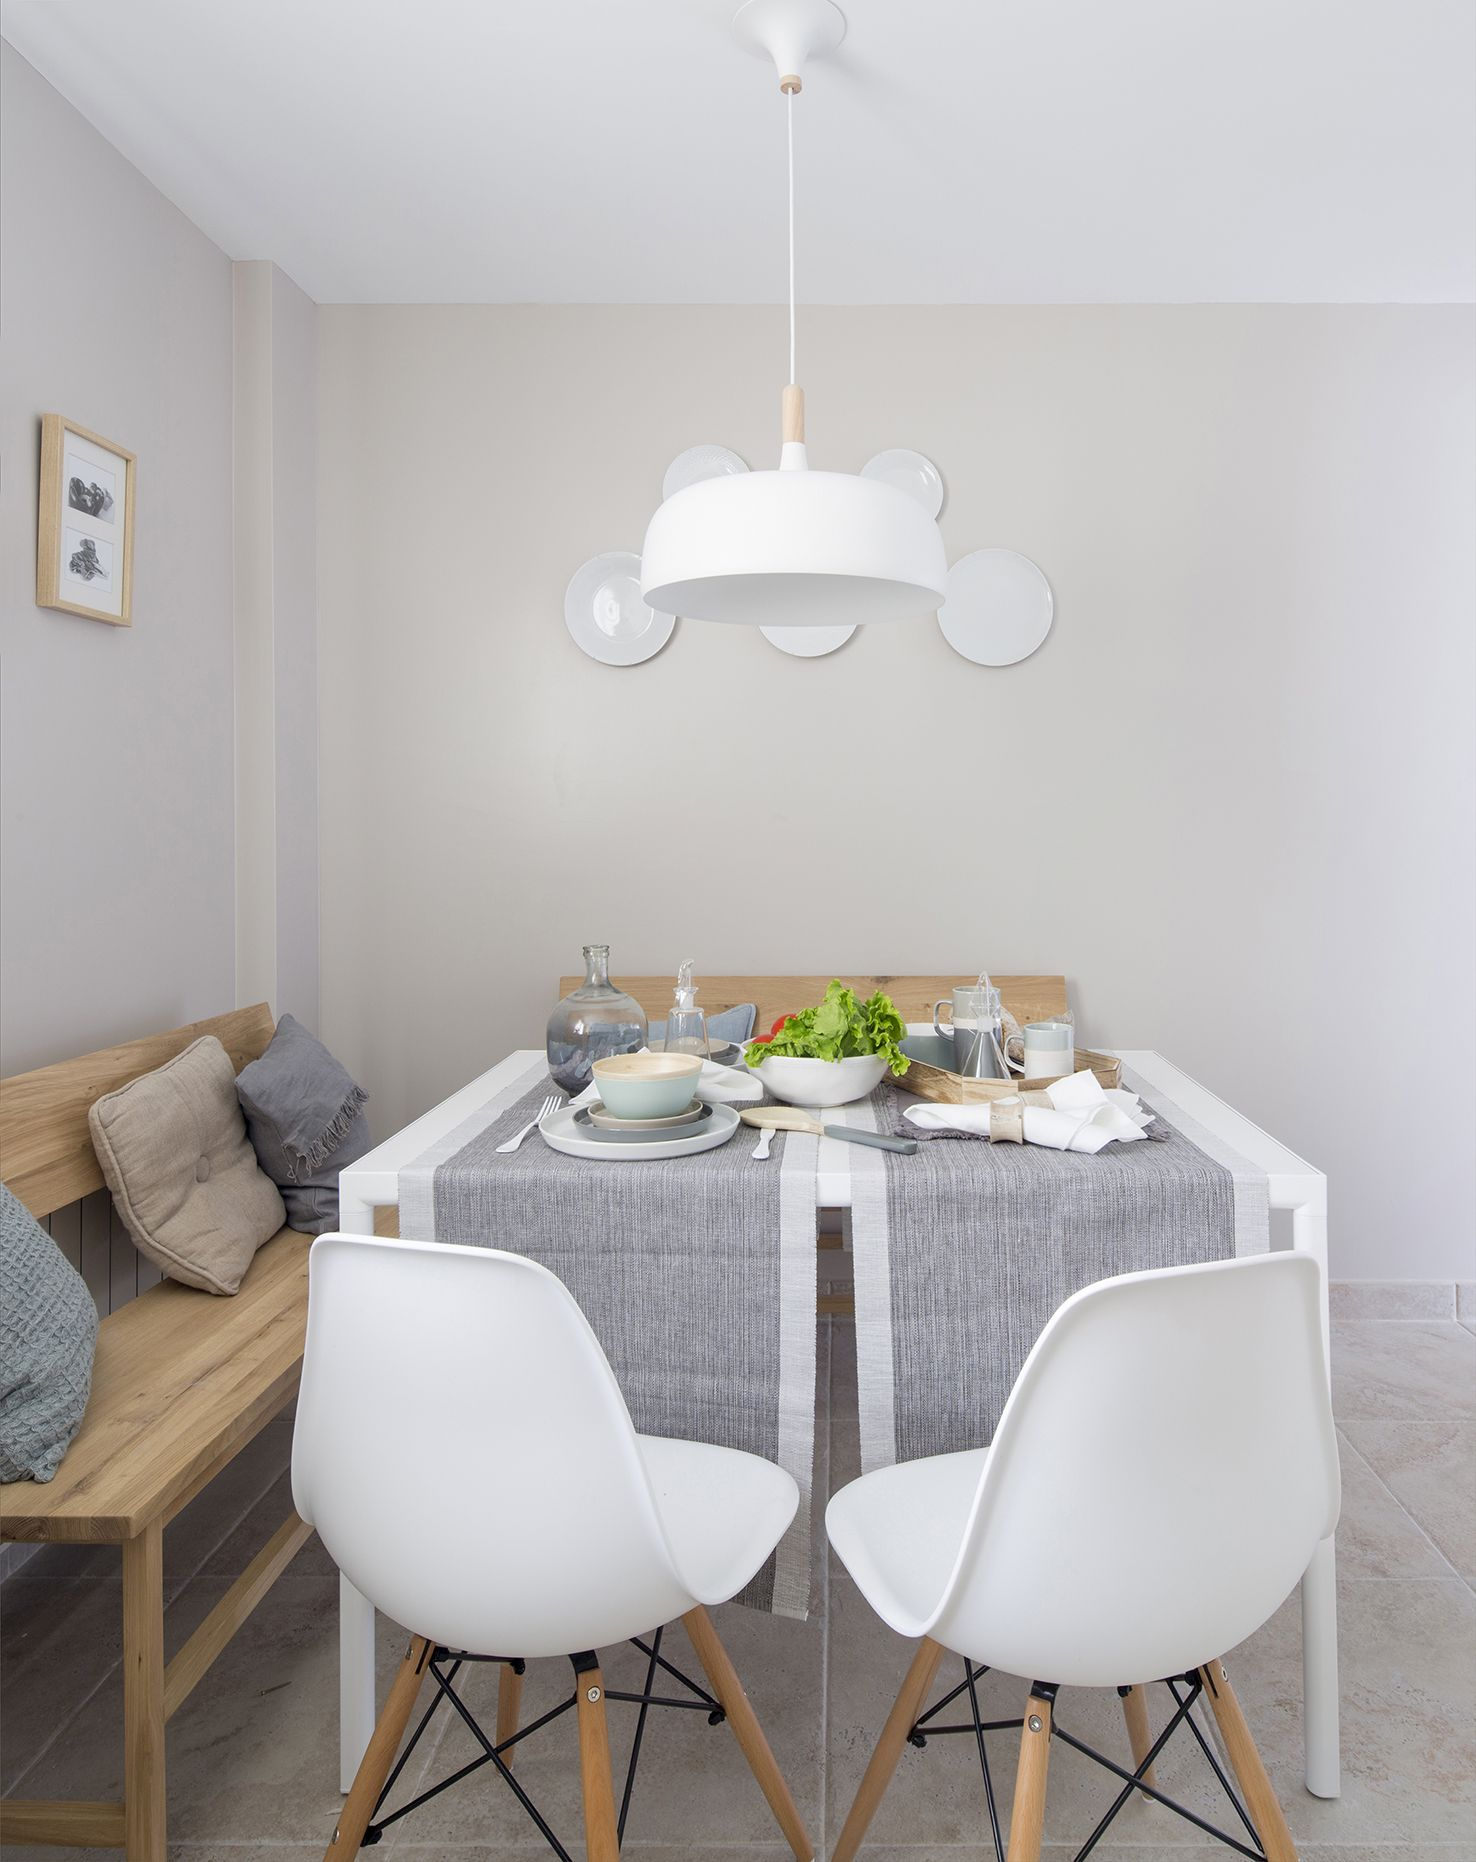 Office cocina en vivienda ntegramente reformada por - Natalia zubizarreta interiorismo ...